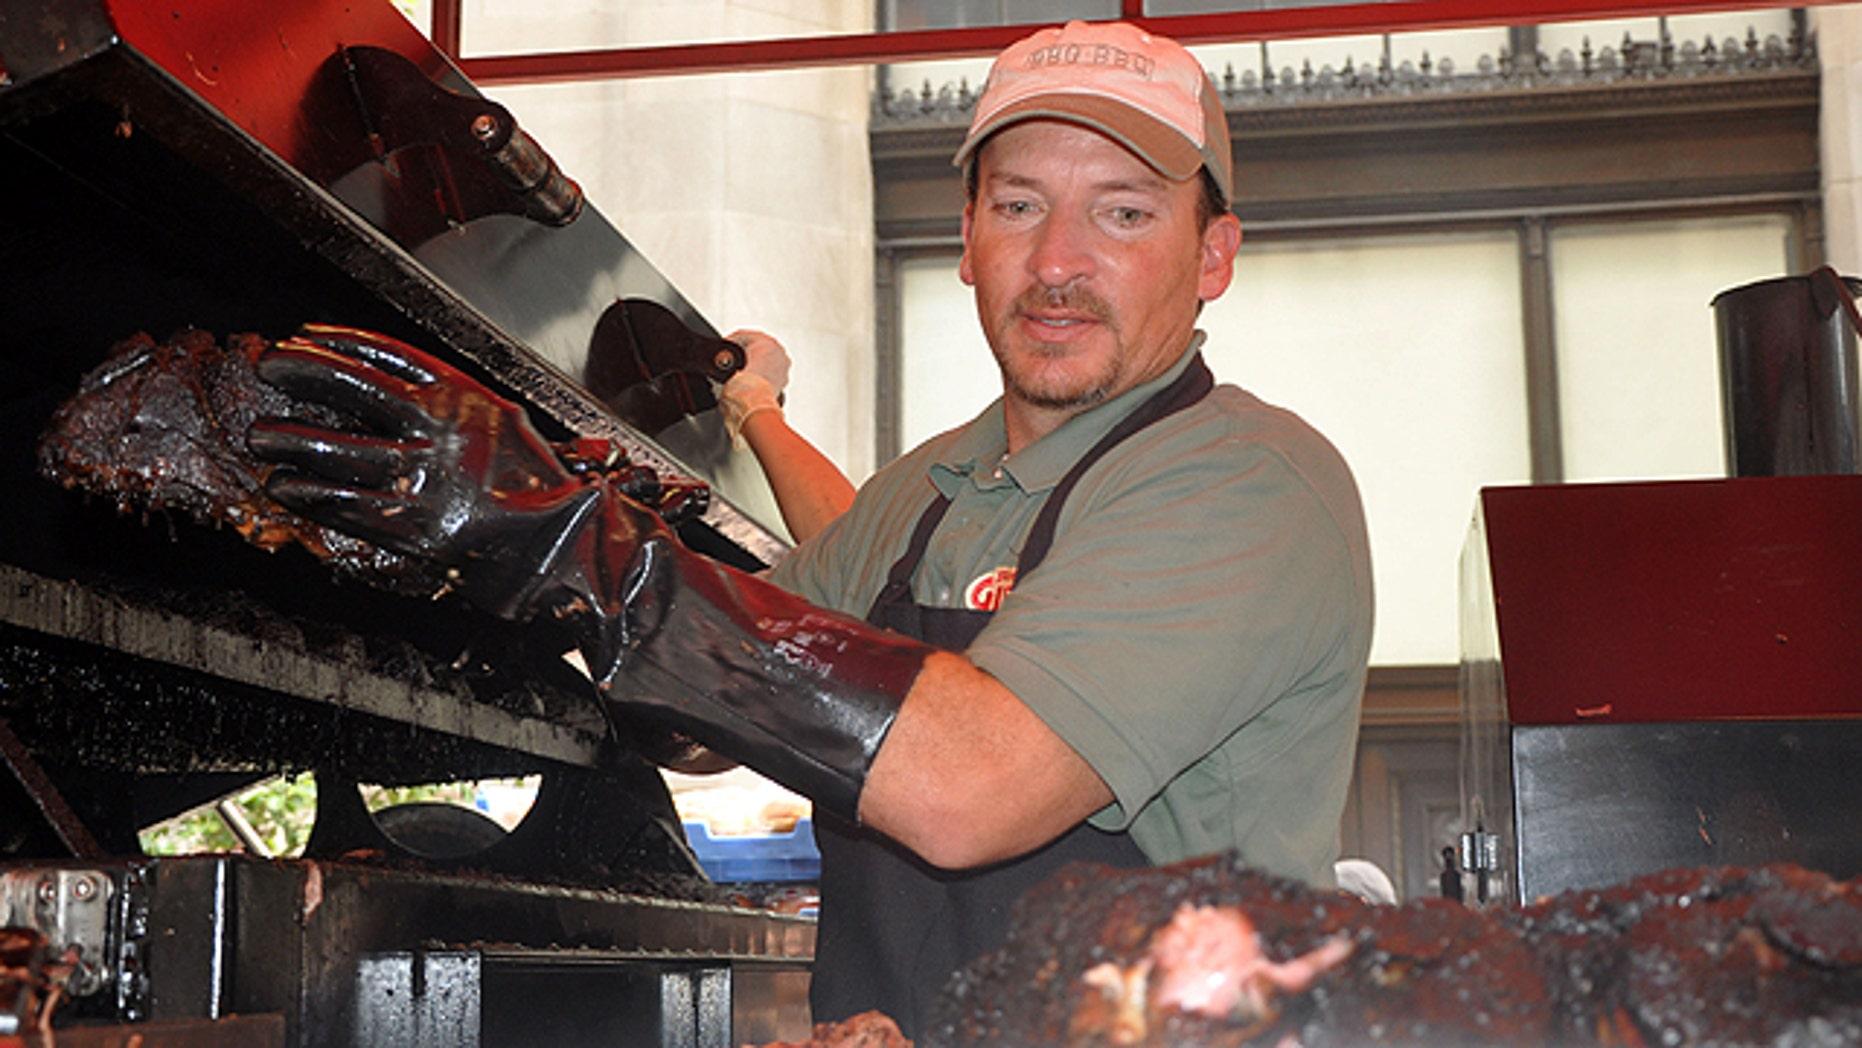 Pitmaster Chris Lilly of Big Bob Gibson Bar-B-Q